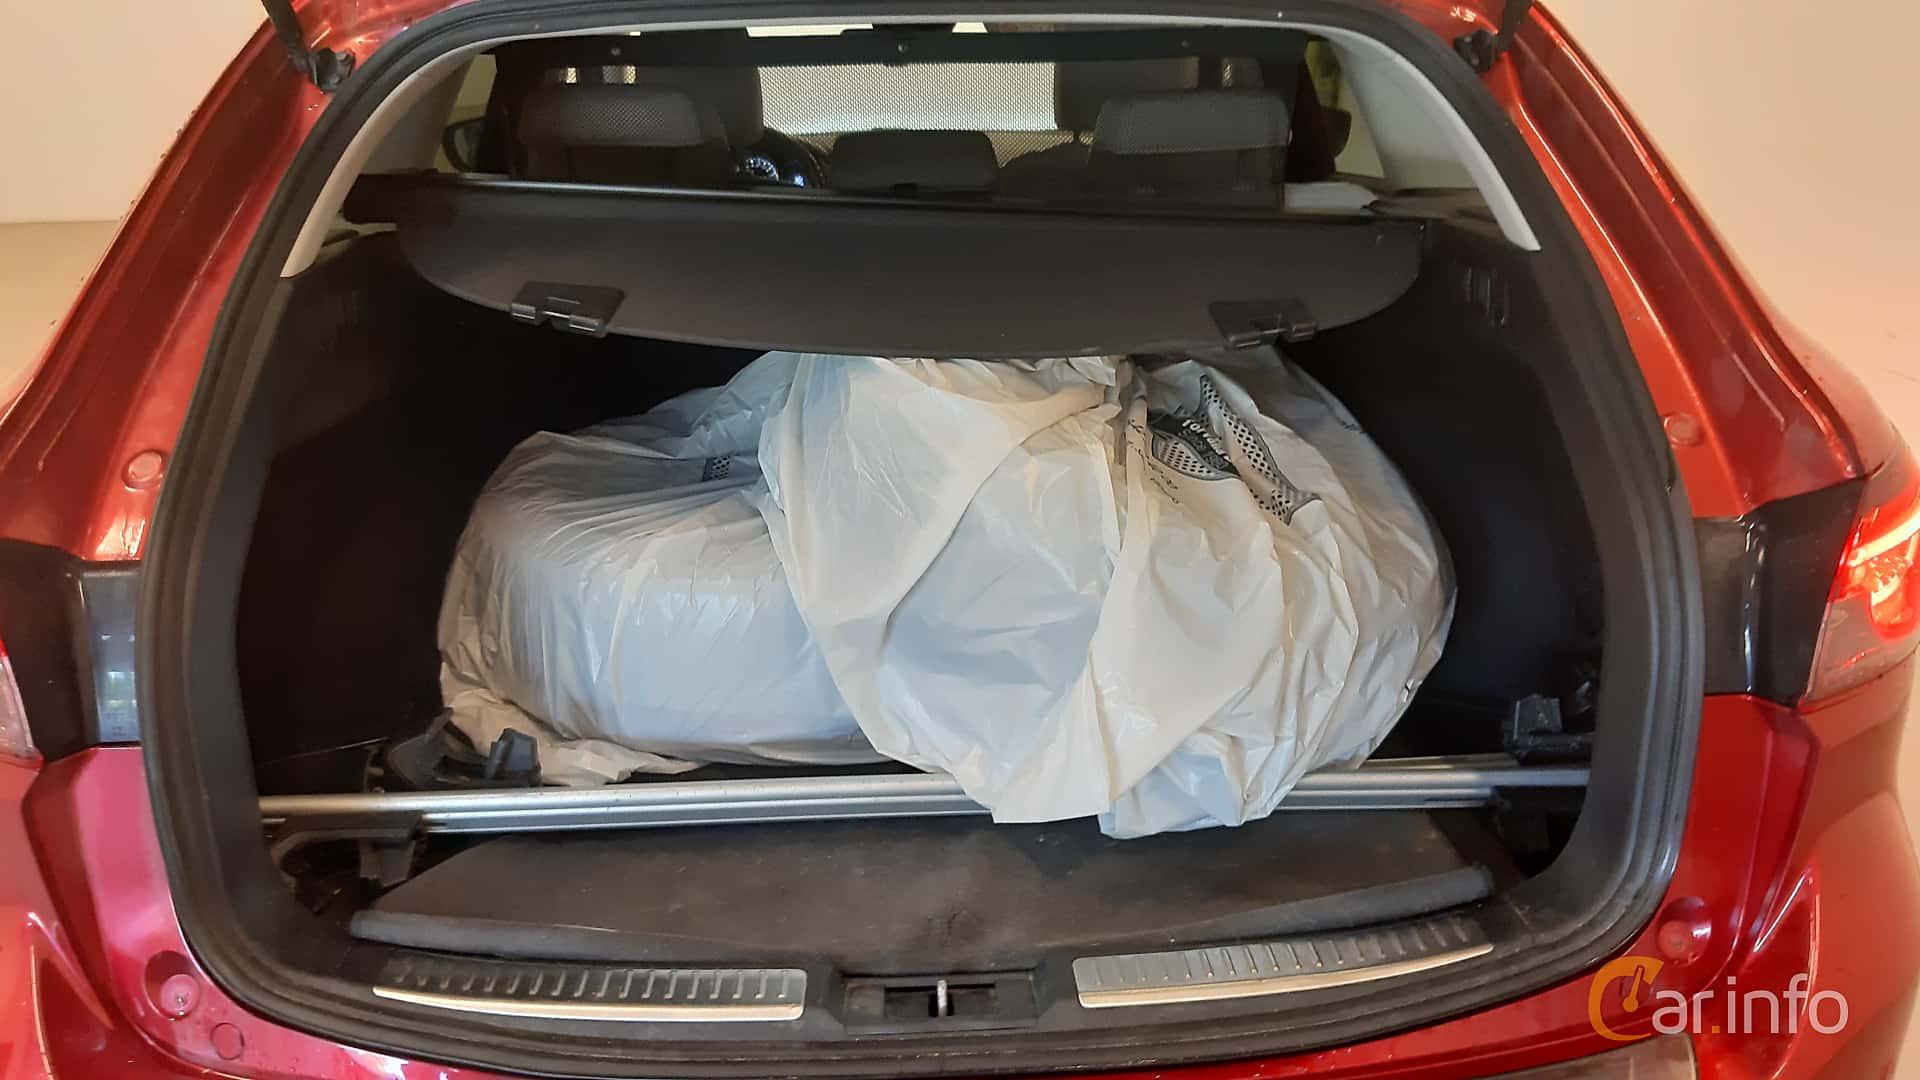 Mazda 6 Wagon 2.2 SKYACTIV-D AWD Automatic, 175hp, 2016